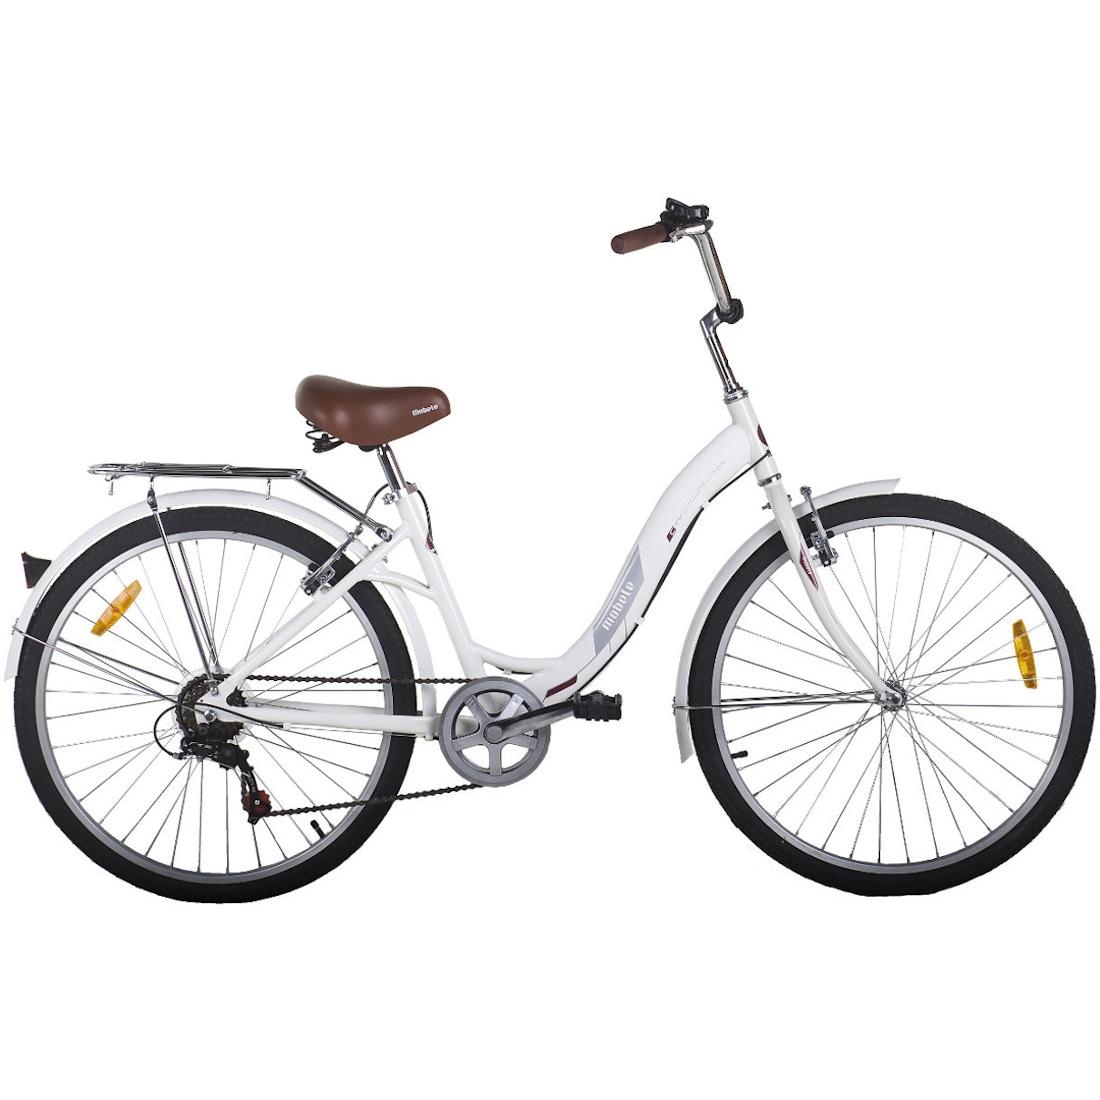 Bicicleta Vintage Retrô Hit Aro 26 7V Shimano Branca Mobele